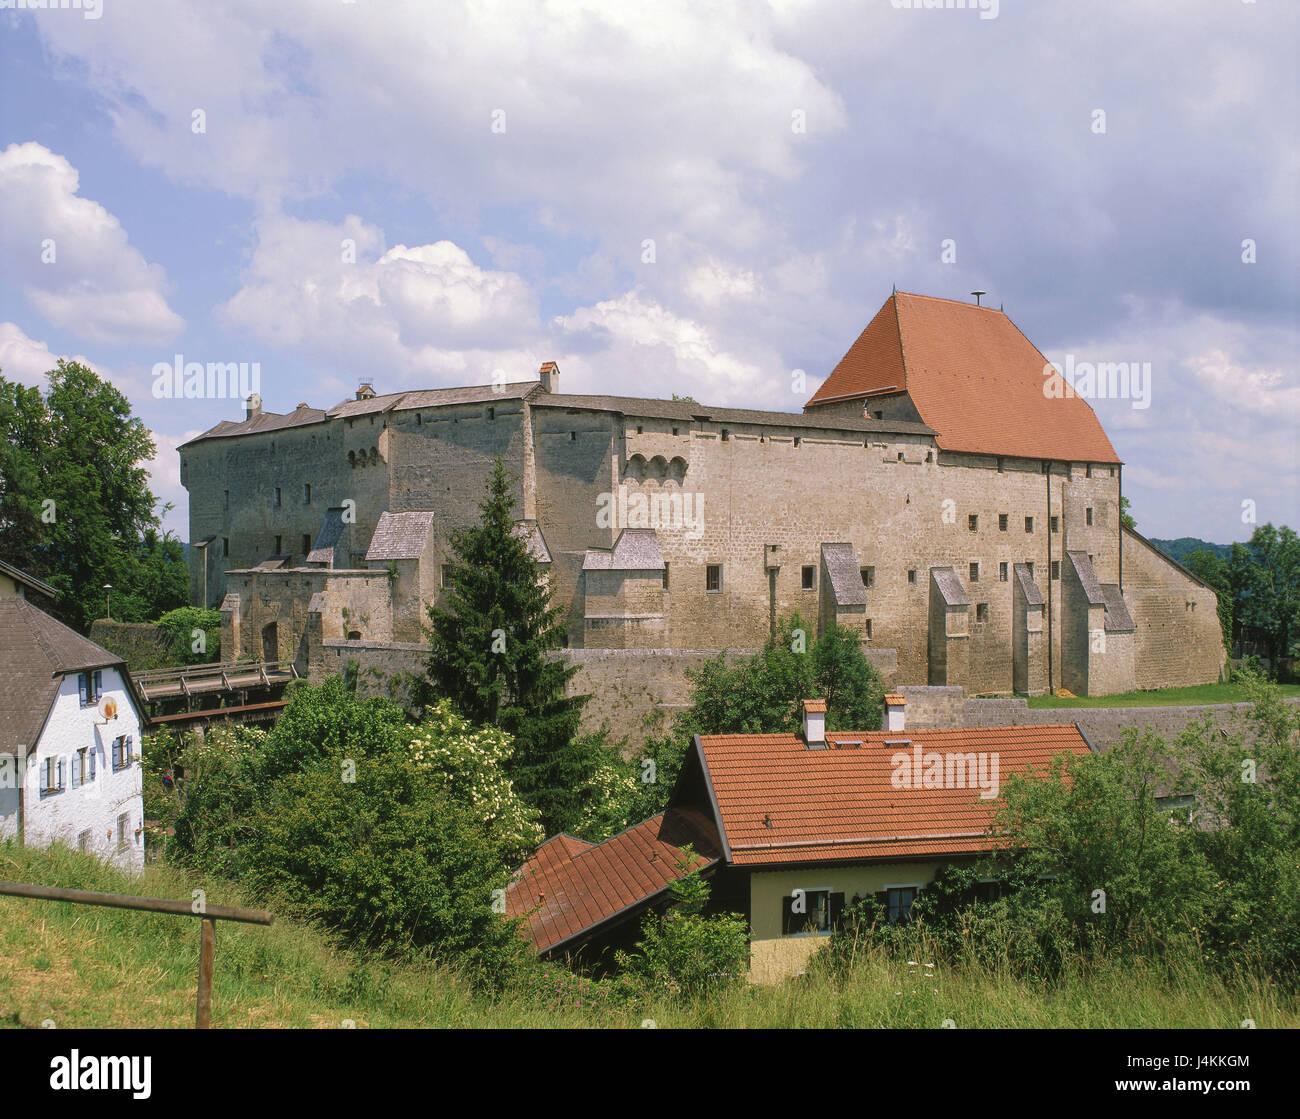 Germany, Bavaria, Tittmoning, castle Europe, Upper Bavaria, town, place of interest, architecture, building, 13. Stock Photo